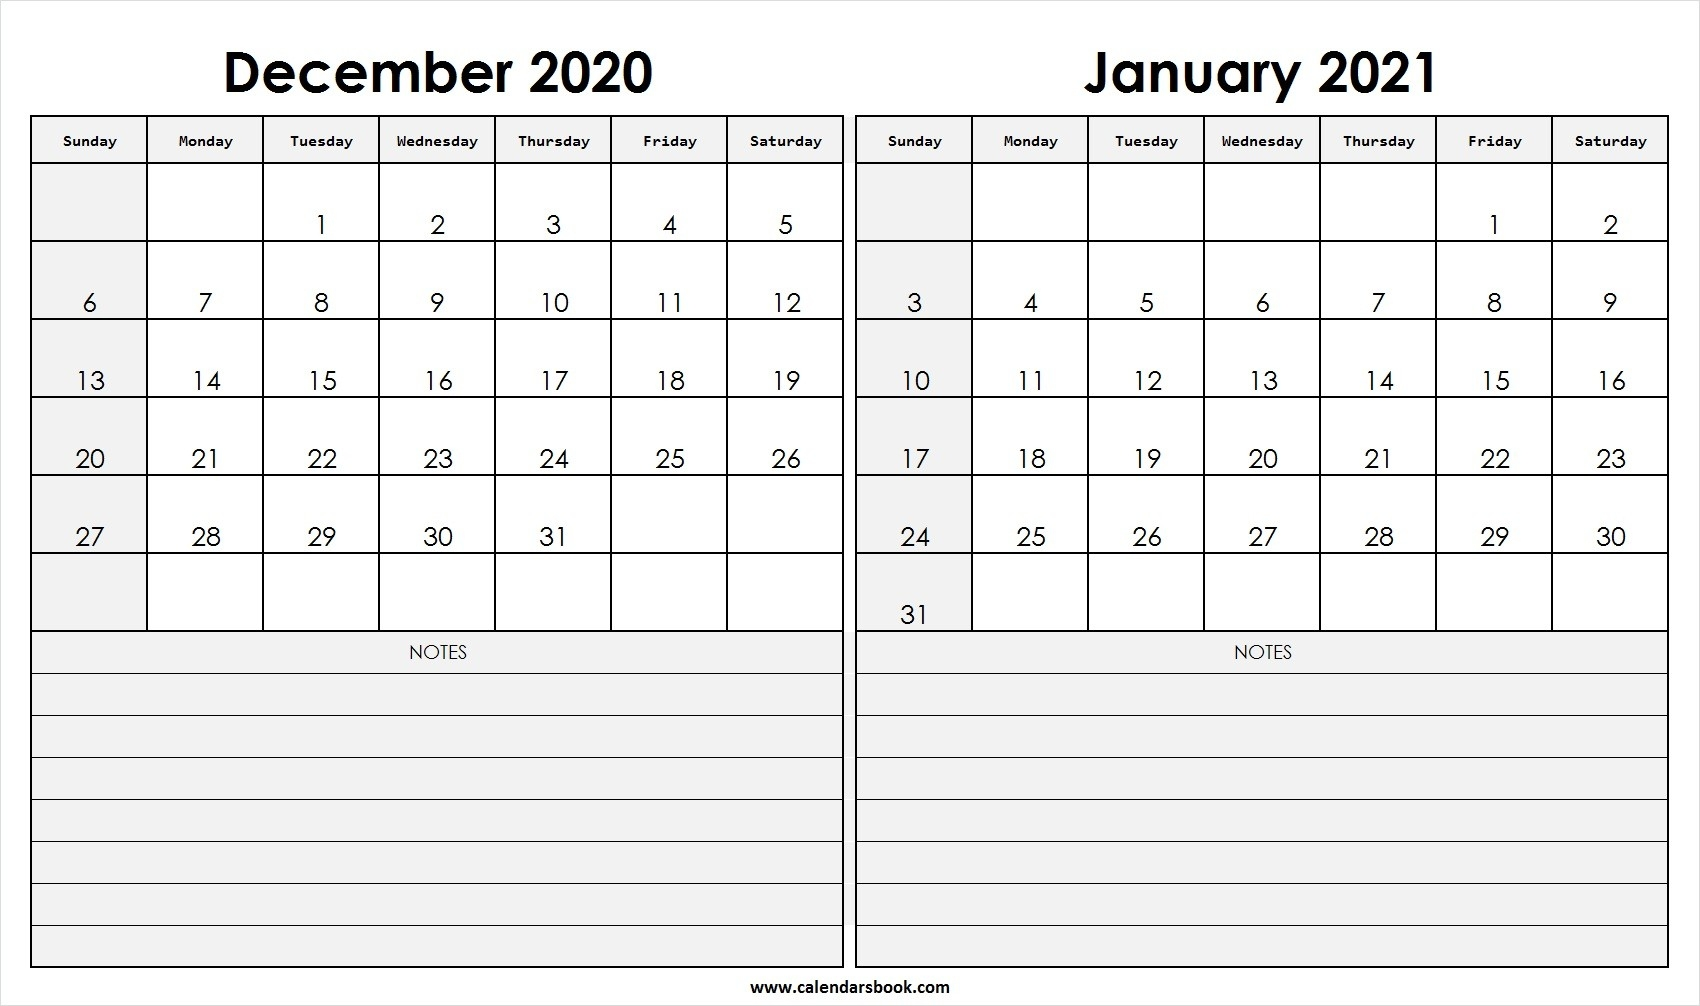 Print December 2020 January 2021 Calendar Template | 2 Month-December 2020 And January 2021 Calendar